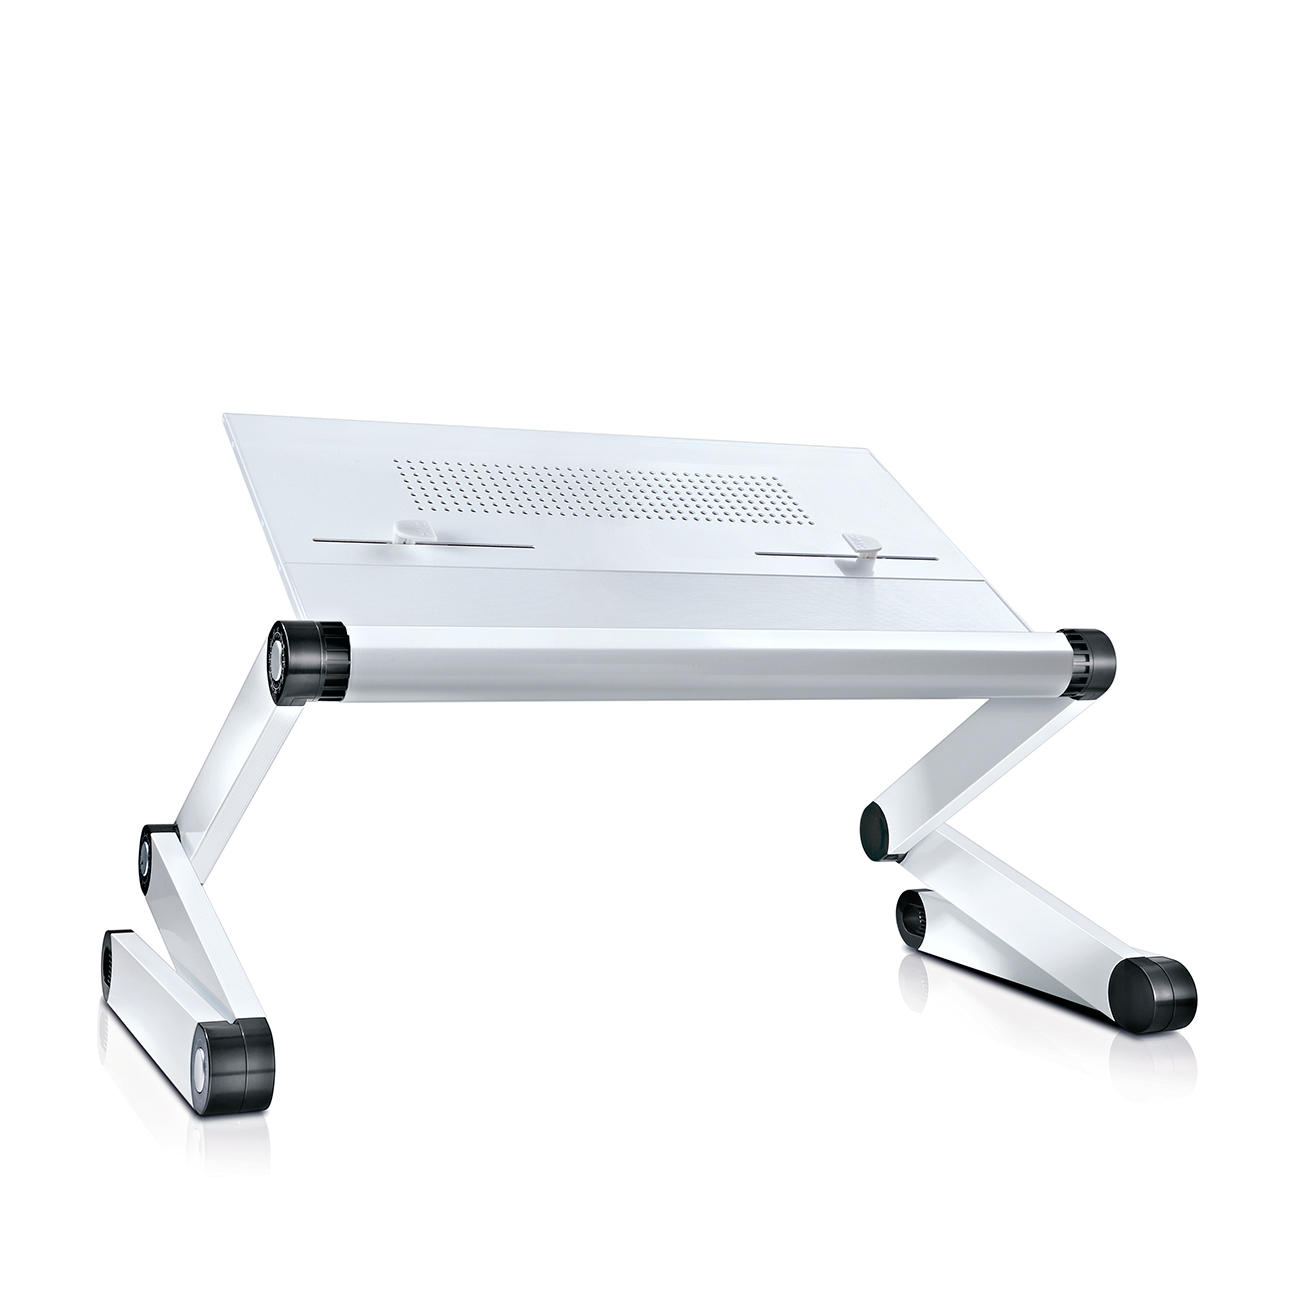 Vario Laptoptafel 3 Jaar Productgarantie Pro Idee